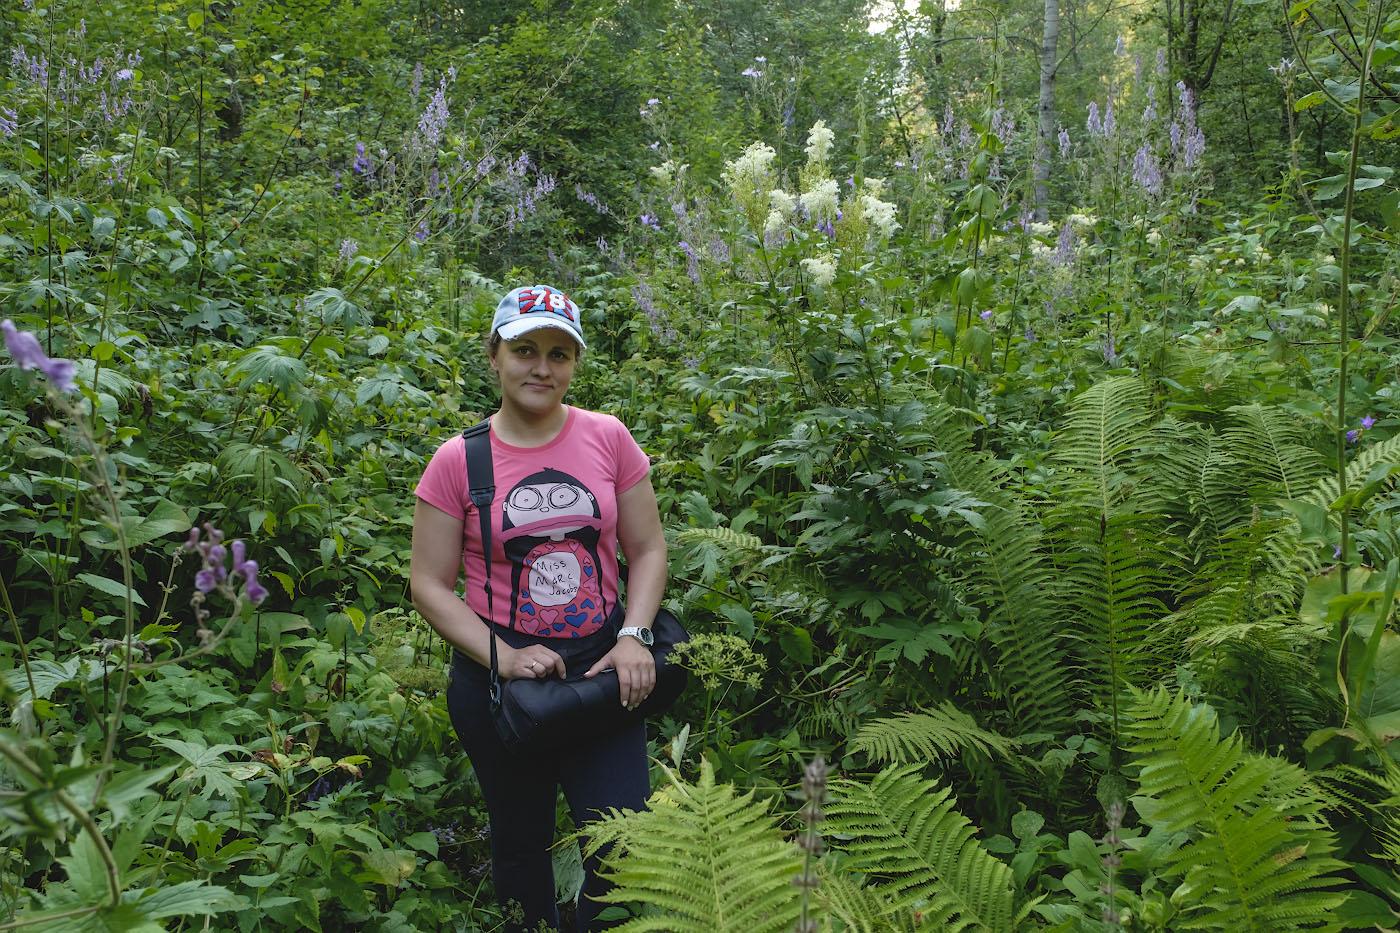 Фотография 19. По Башкирским джунглям идем снимать водопад. У жены в руках чехол от моего карбонового штатива Sirui T-2204X. Камера Fujifilm X-T10, объектив Fujifilm 16-55mm f/2.8.